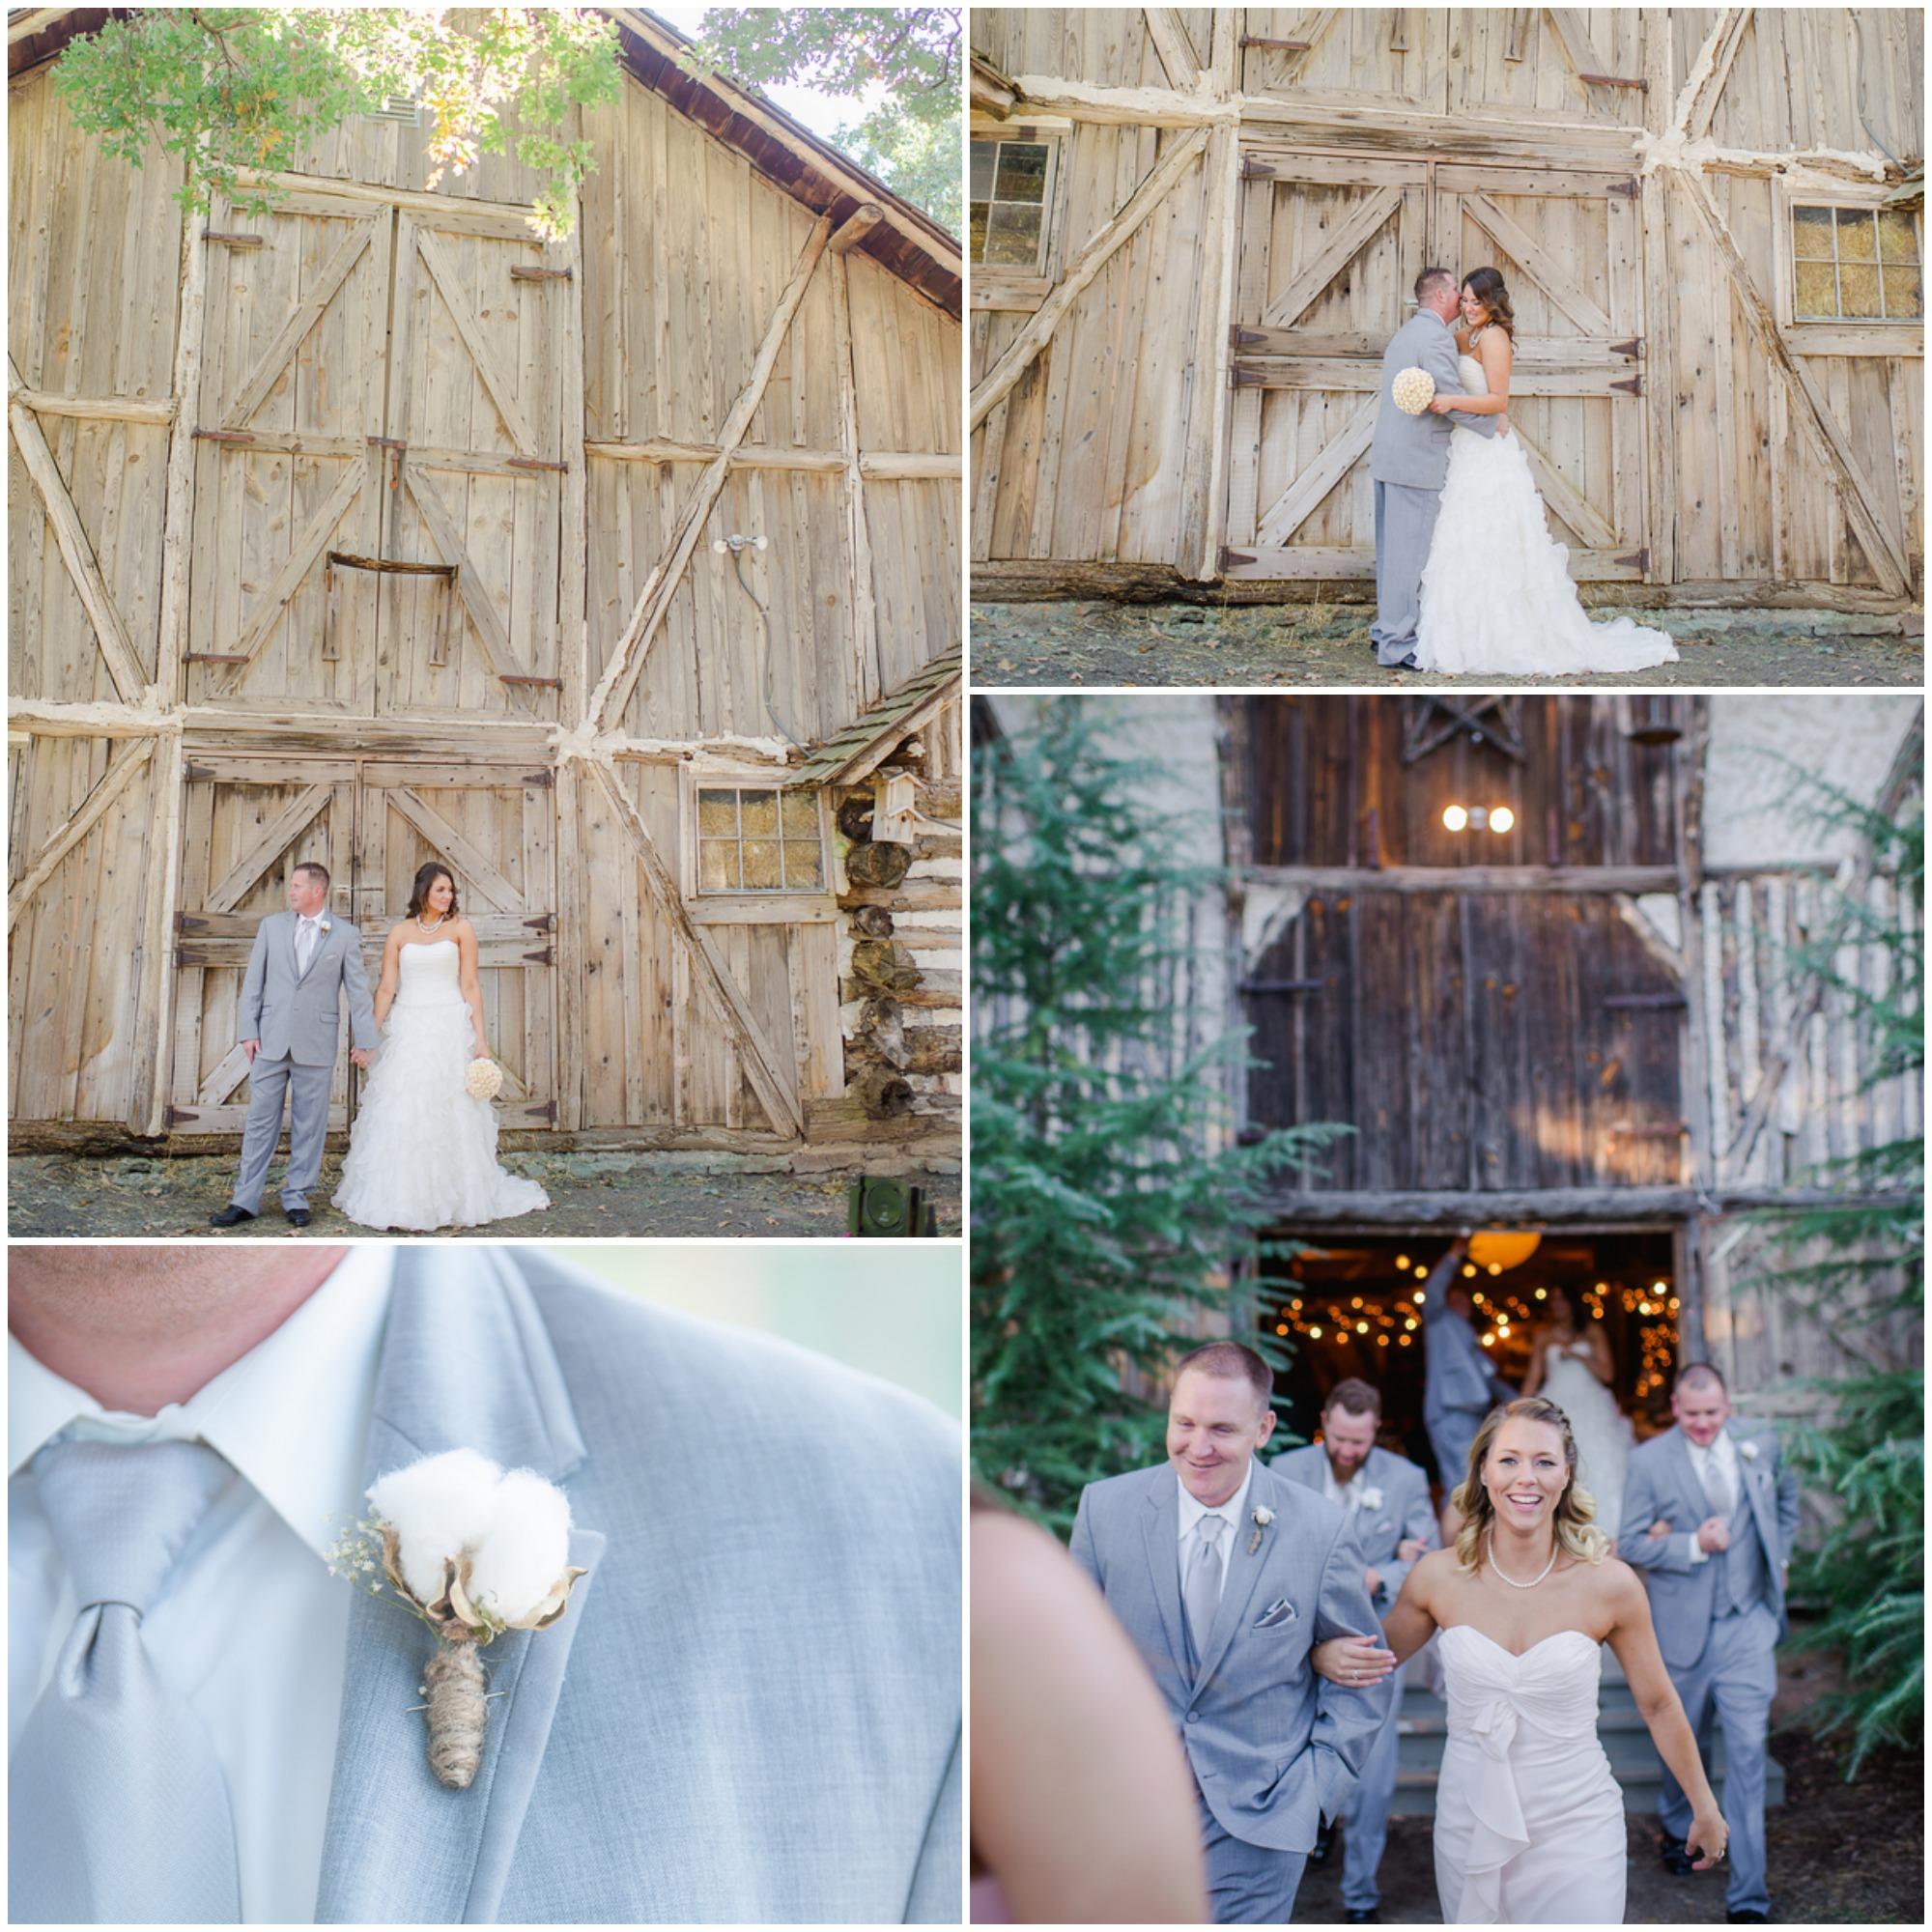 California Rustic Ranch Wedding: Southern Rustic Ranch Wedding